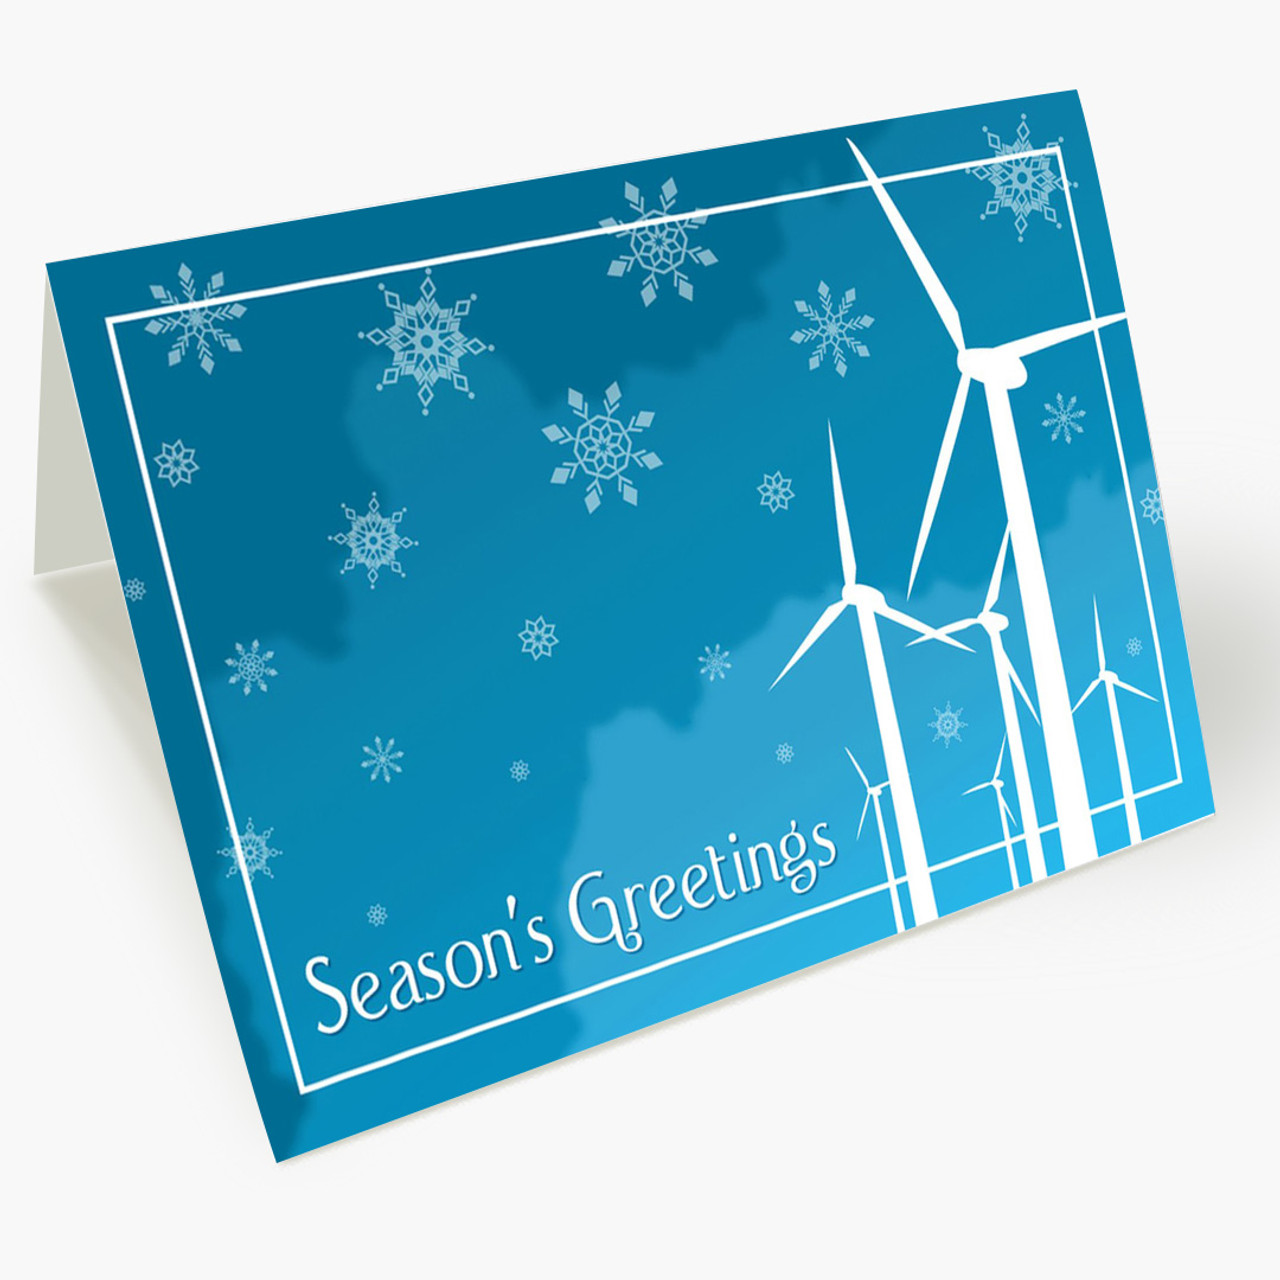 Wind Farm Greetings Christmas Card